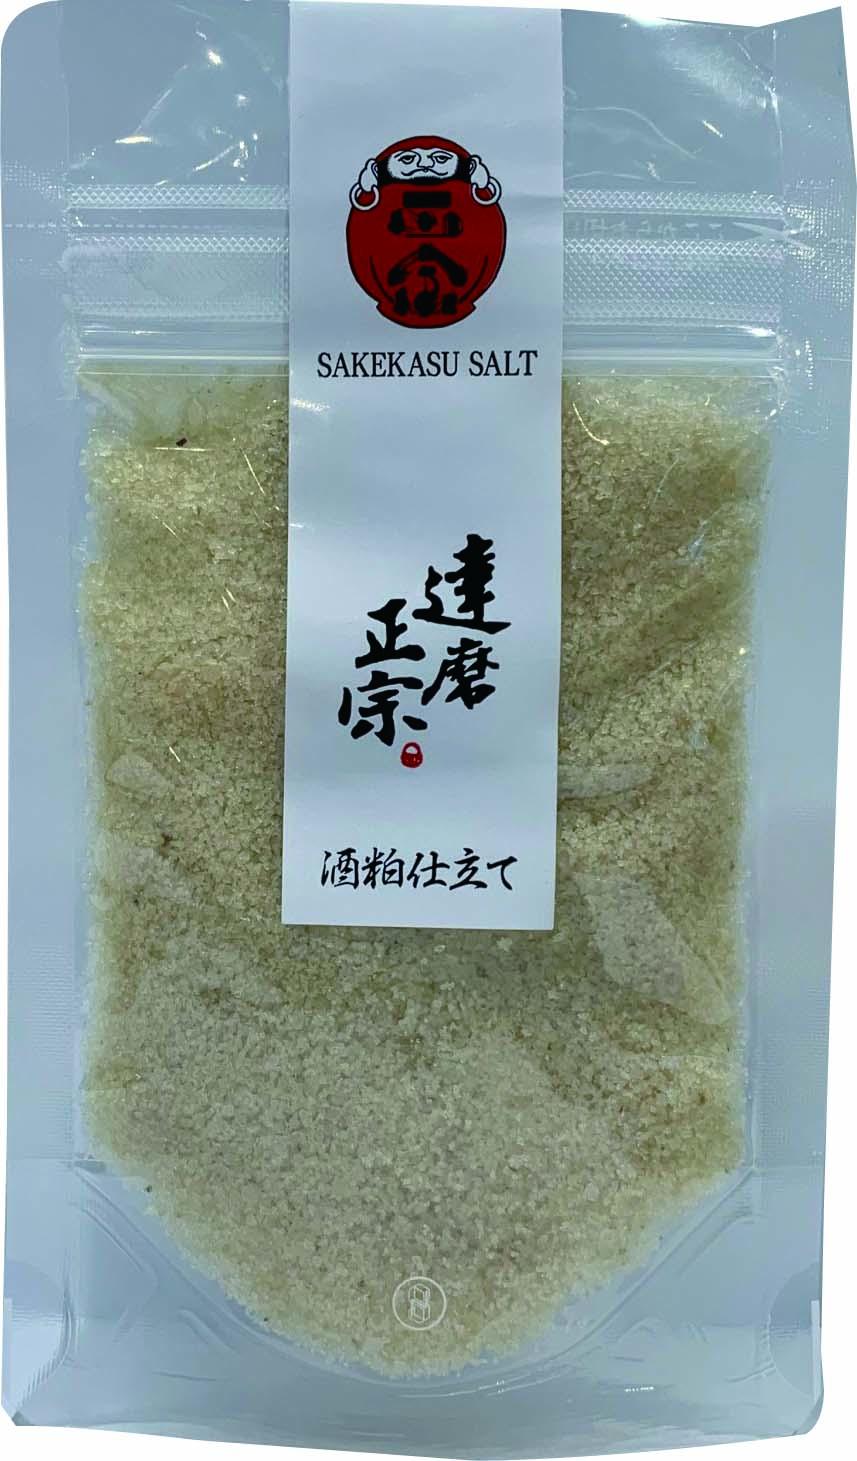 達磨正宗 酒粕仕立て塩